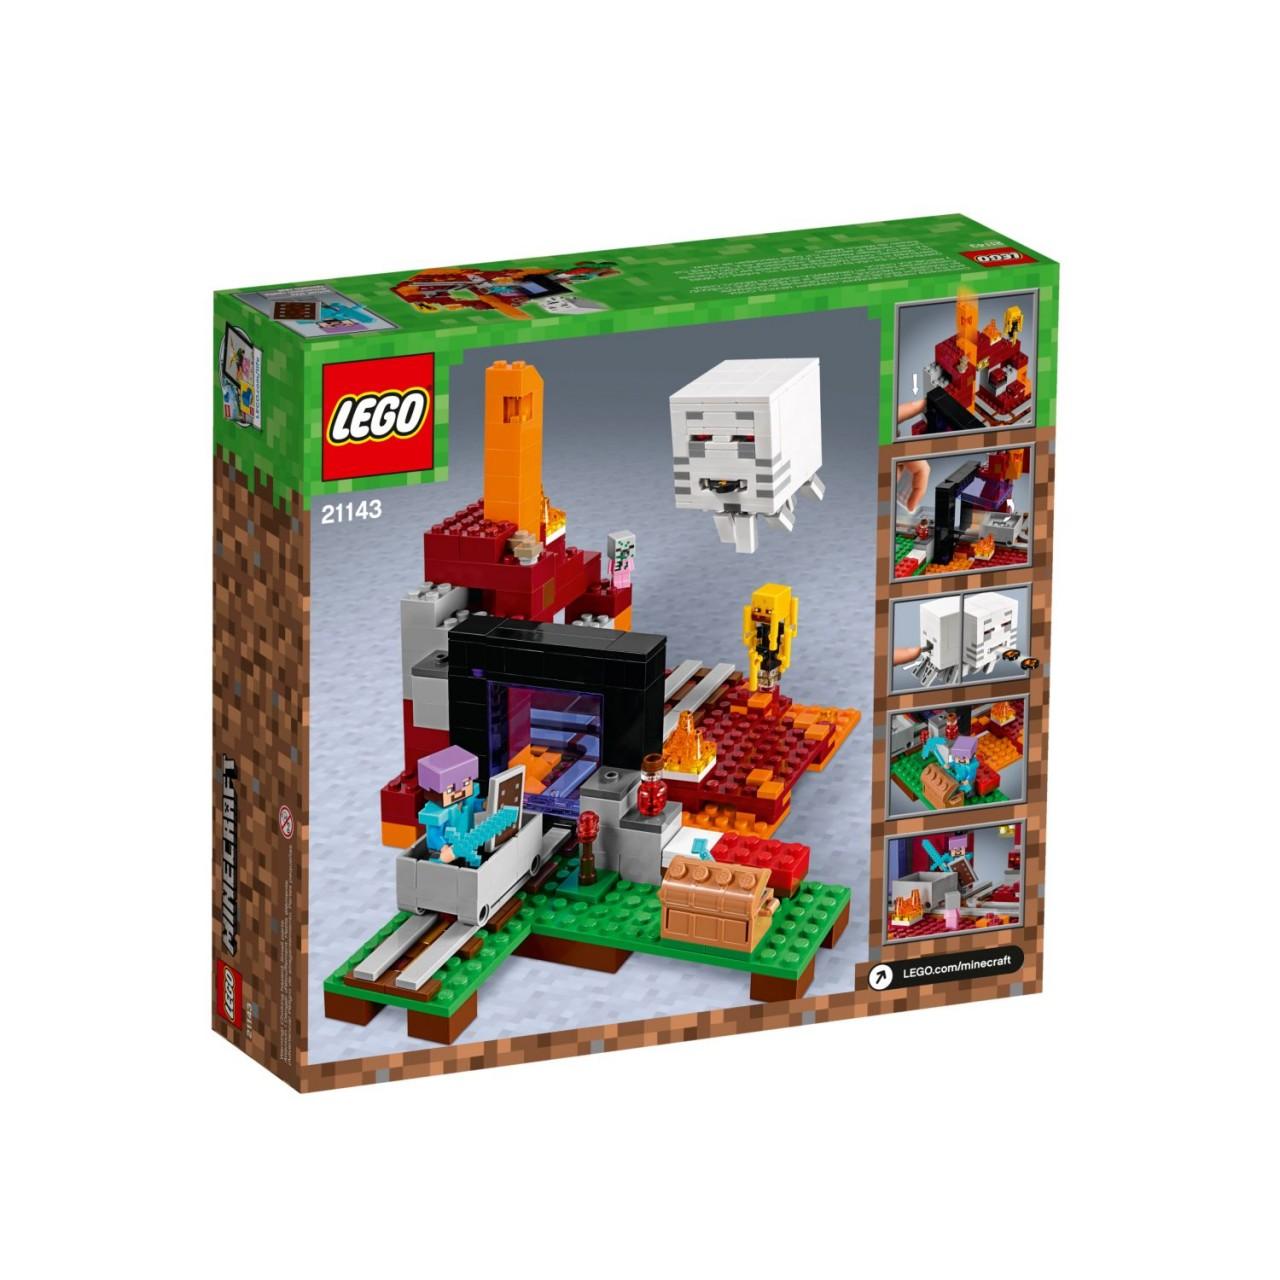 LEGO MINECRAFT 21143 Netherportal